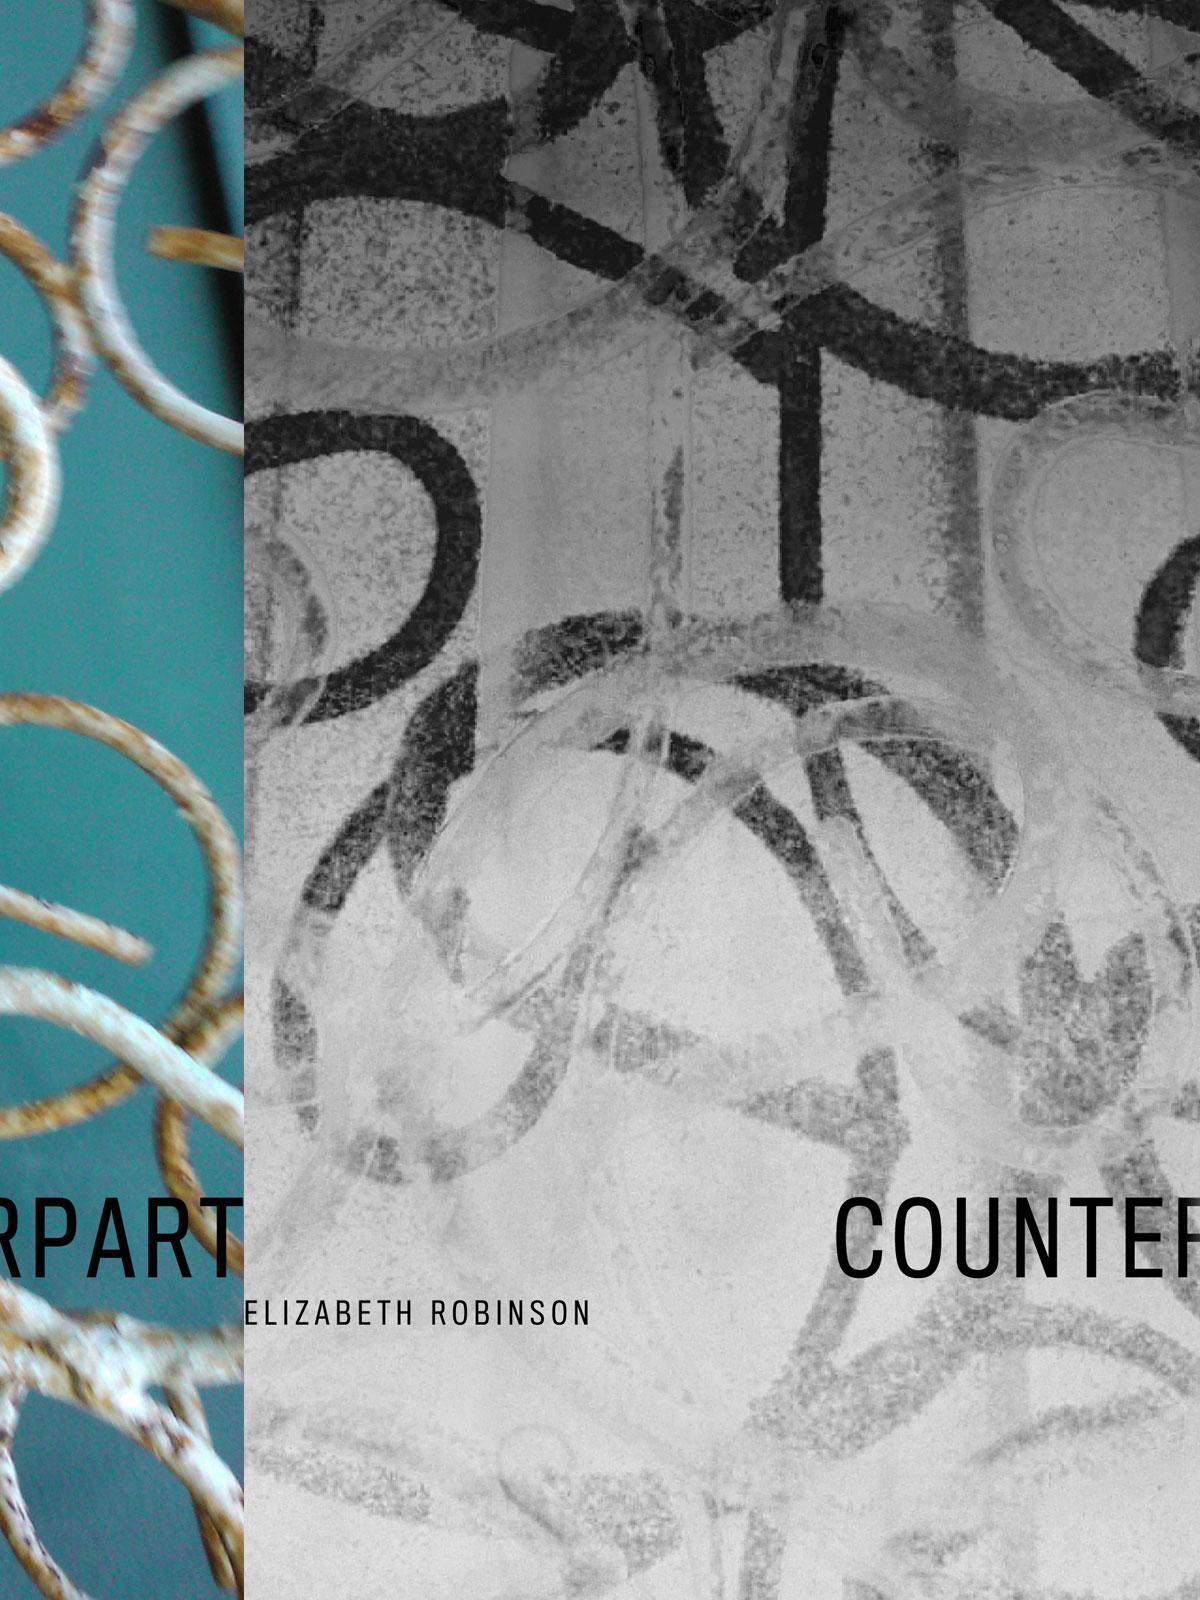 Elizabeth Robinson's Counterpart (Ahsahta Press, 2012)